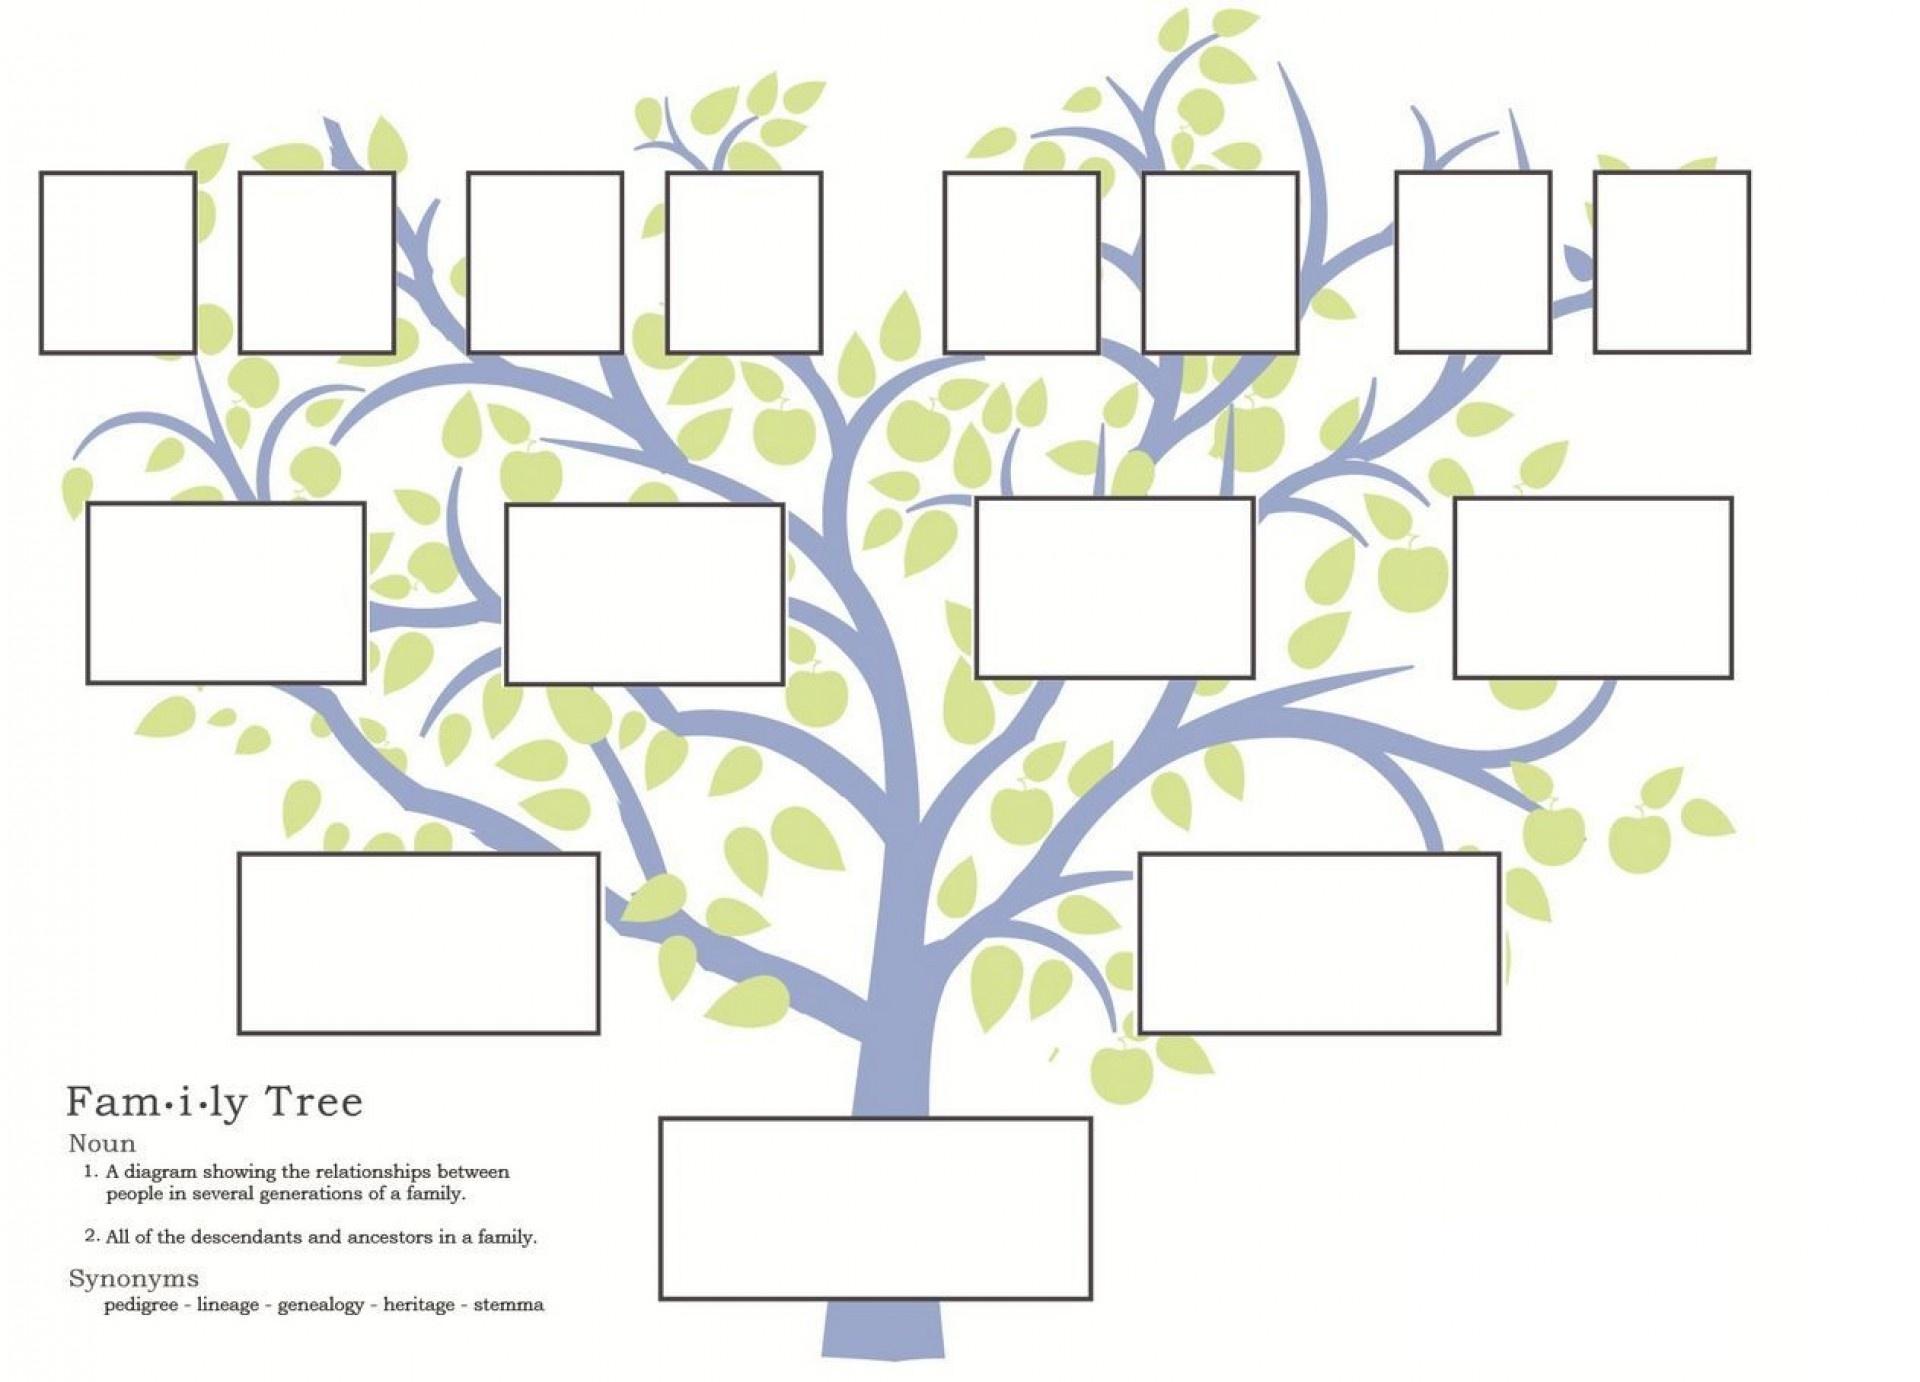 004 Free Family Tree Templates Template Ideas Sensational Editable - Free Printable Family Tree